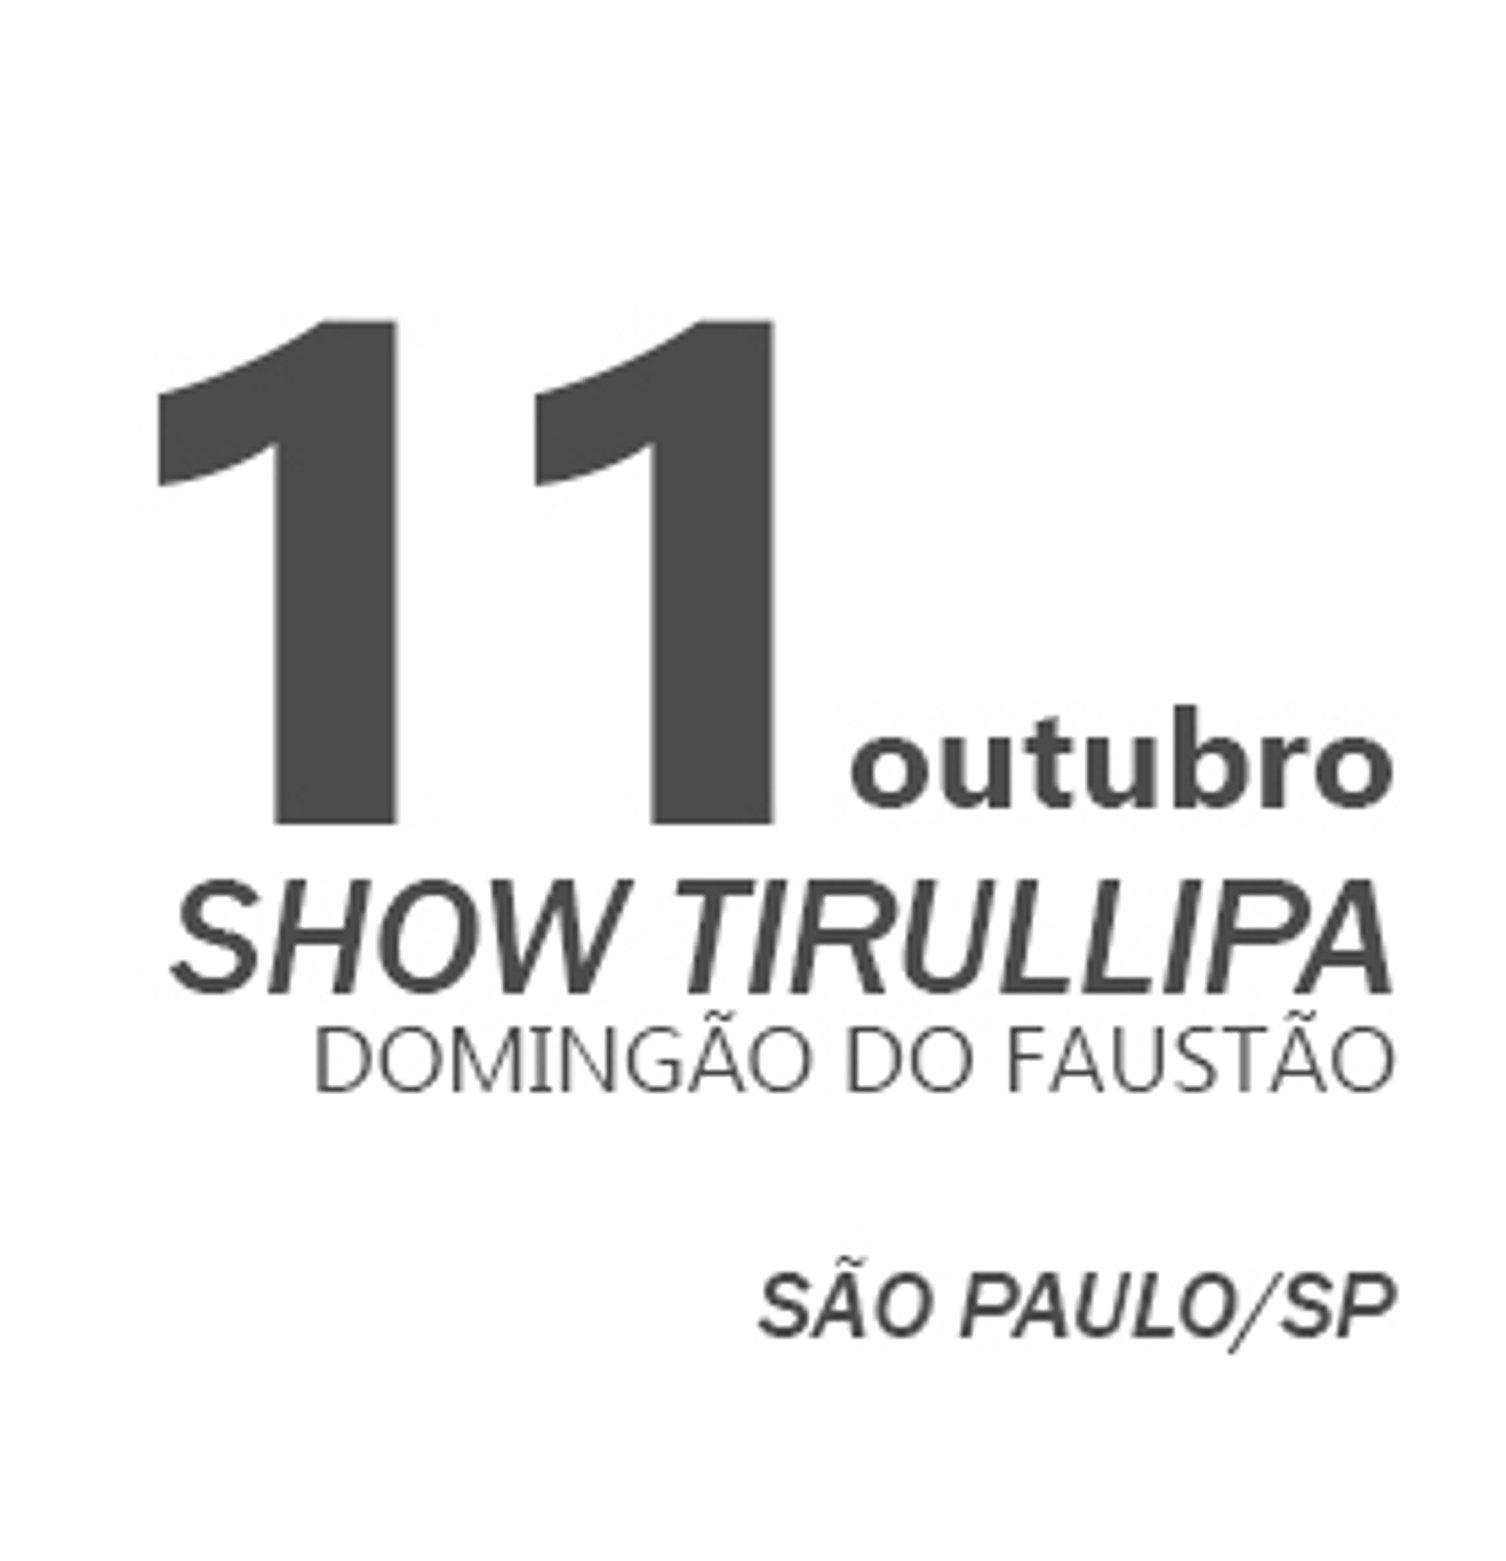 TIRULLIPA EM SÃO PAULO/SP